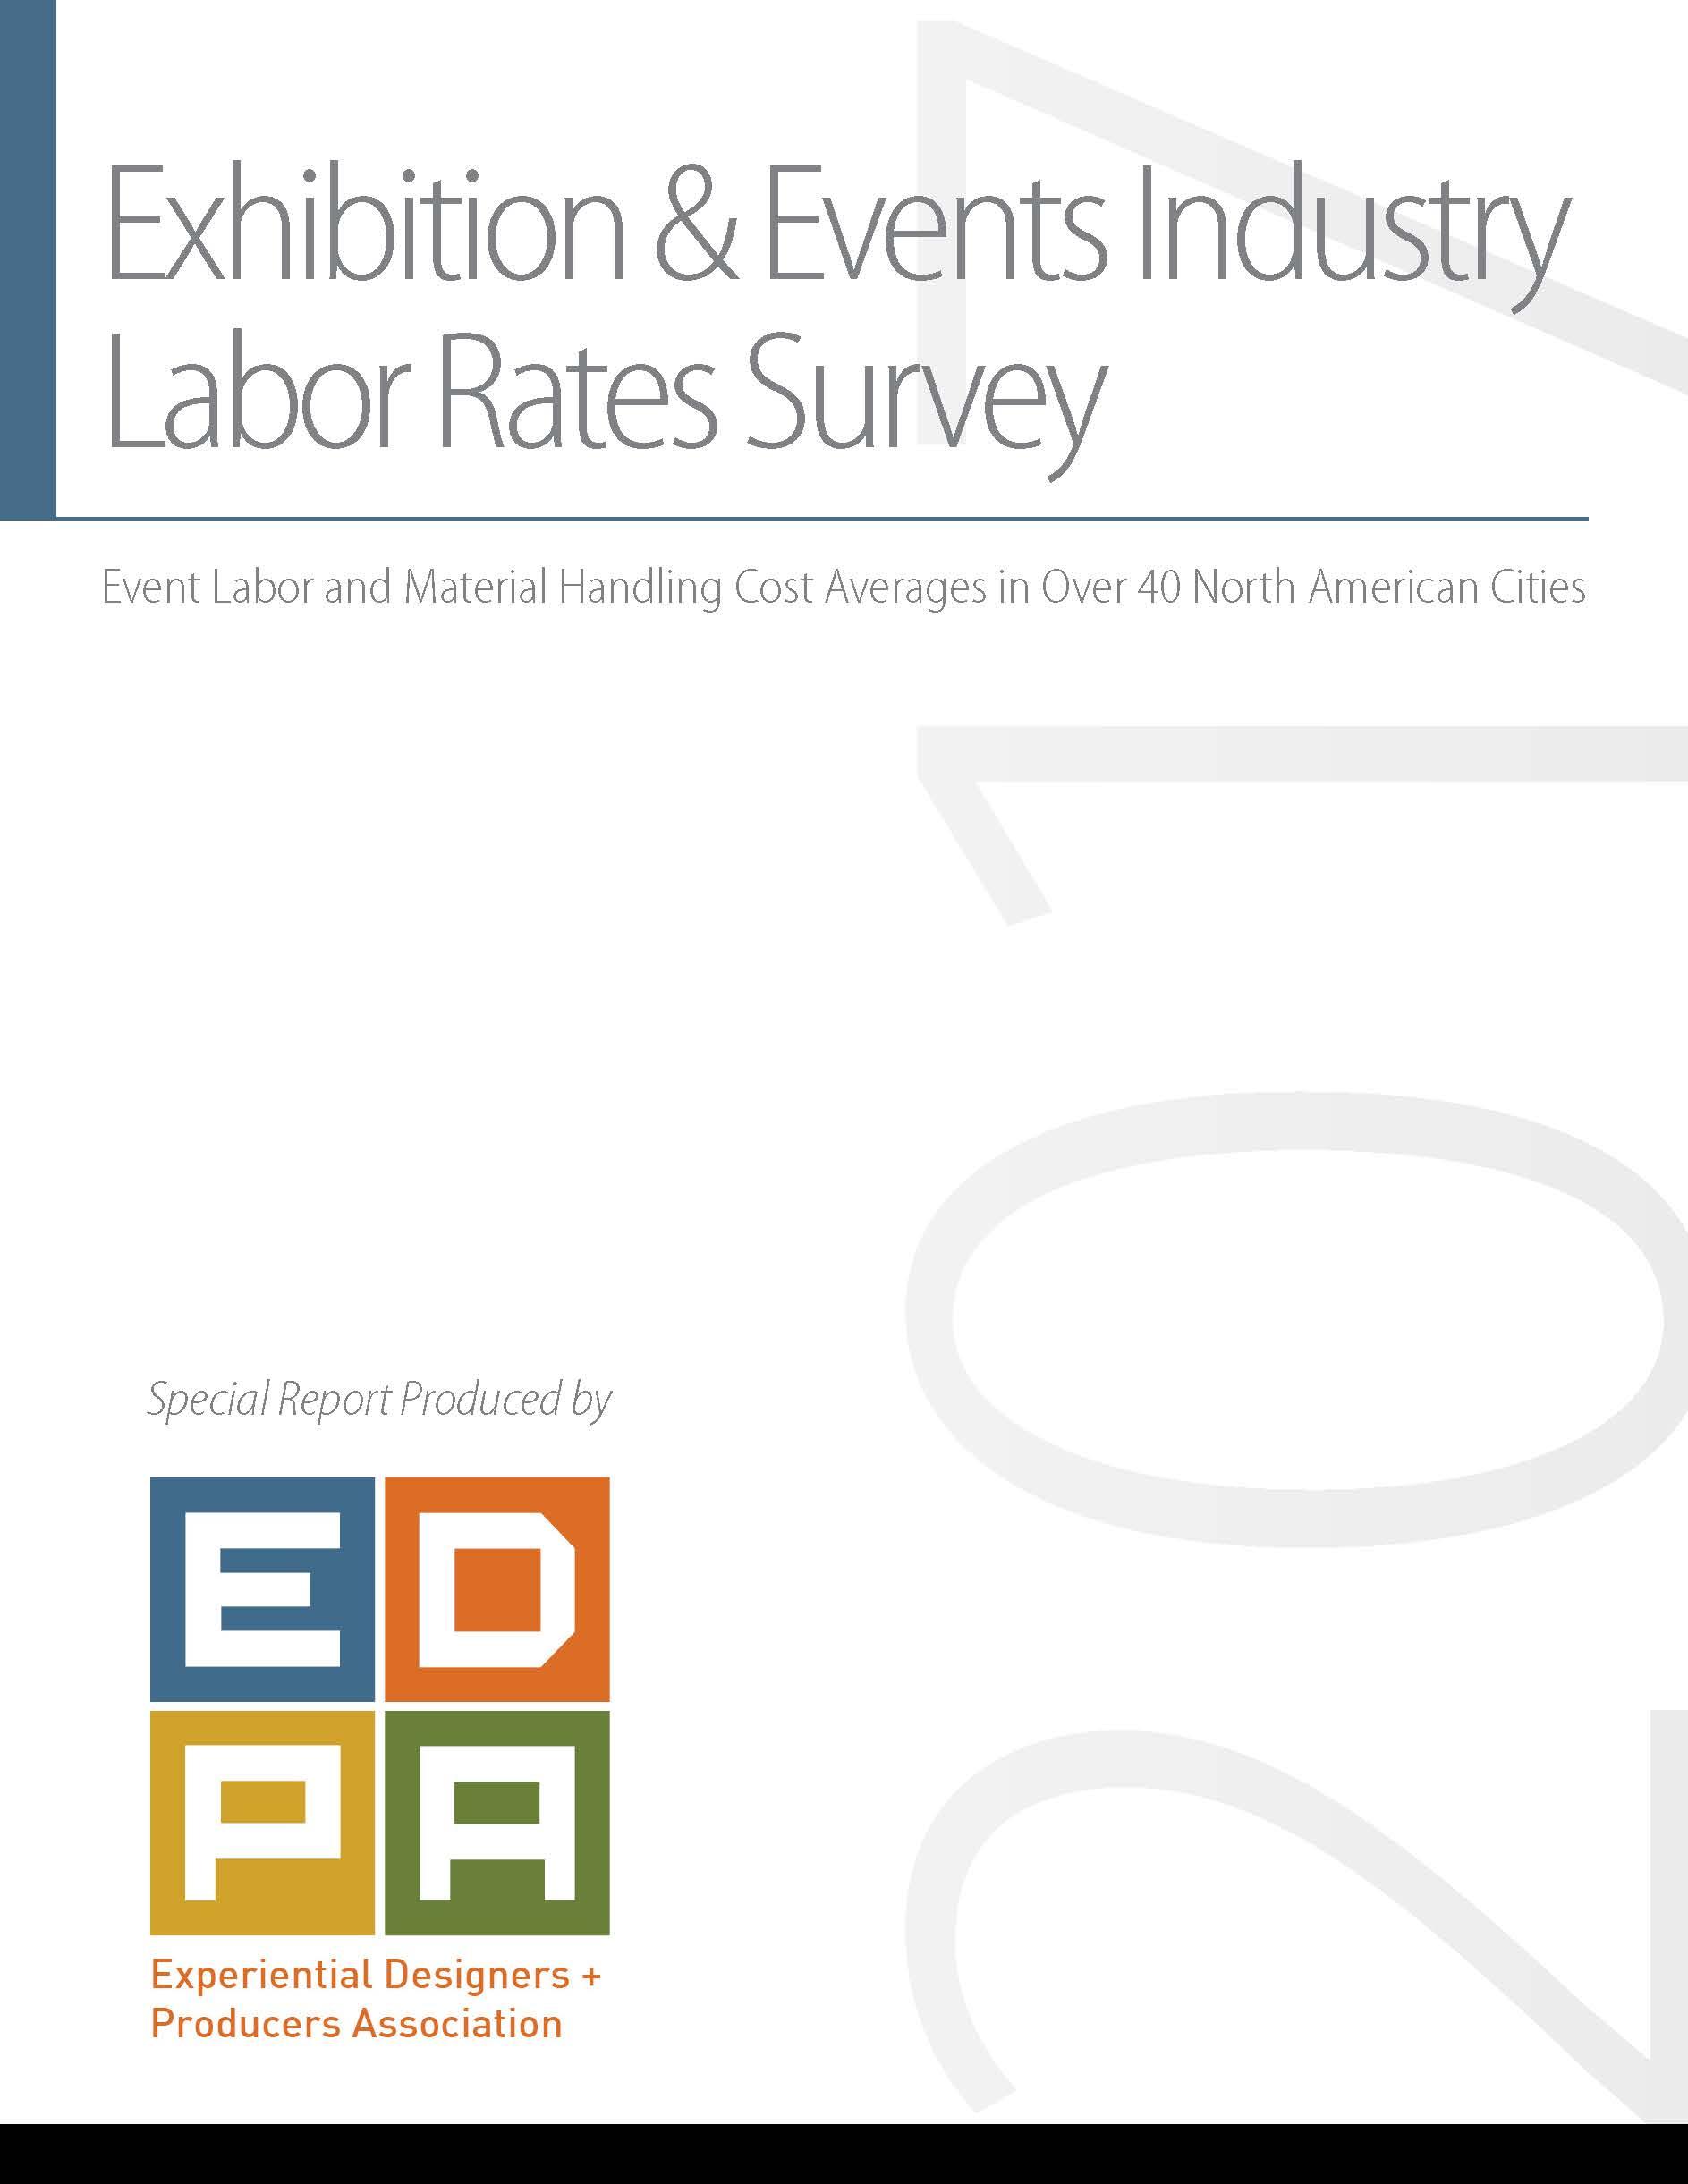 2017 EDPA Labor Rates Study